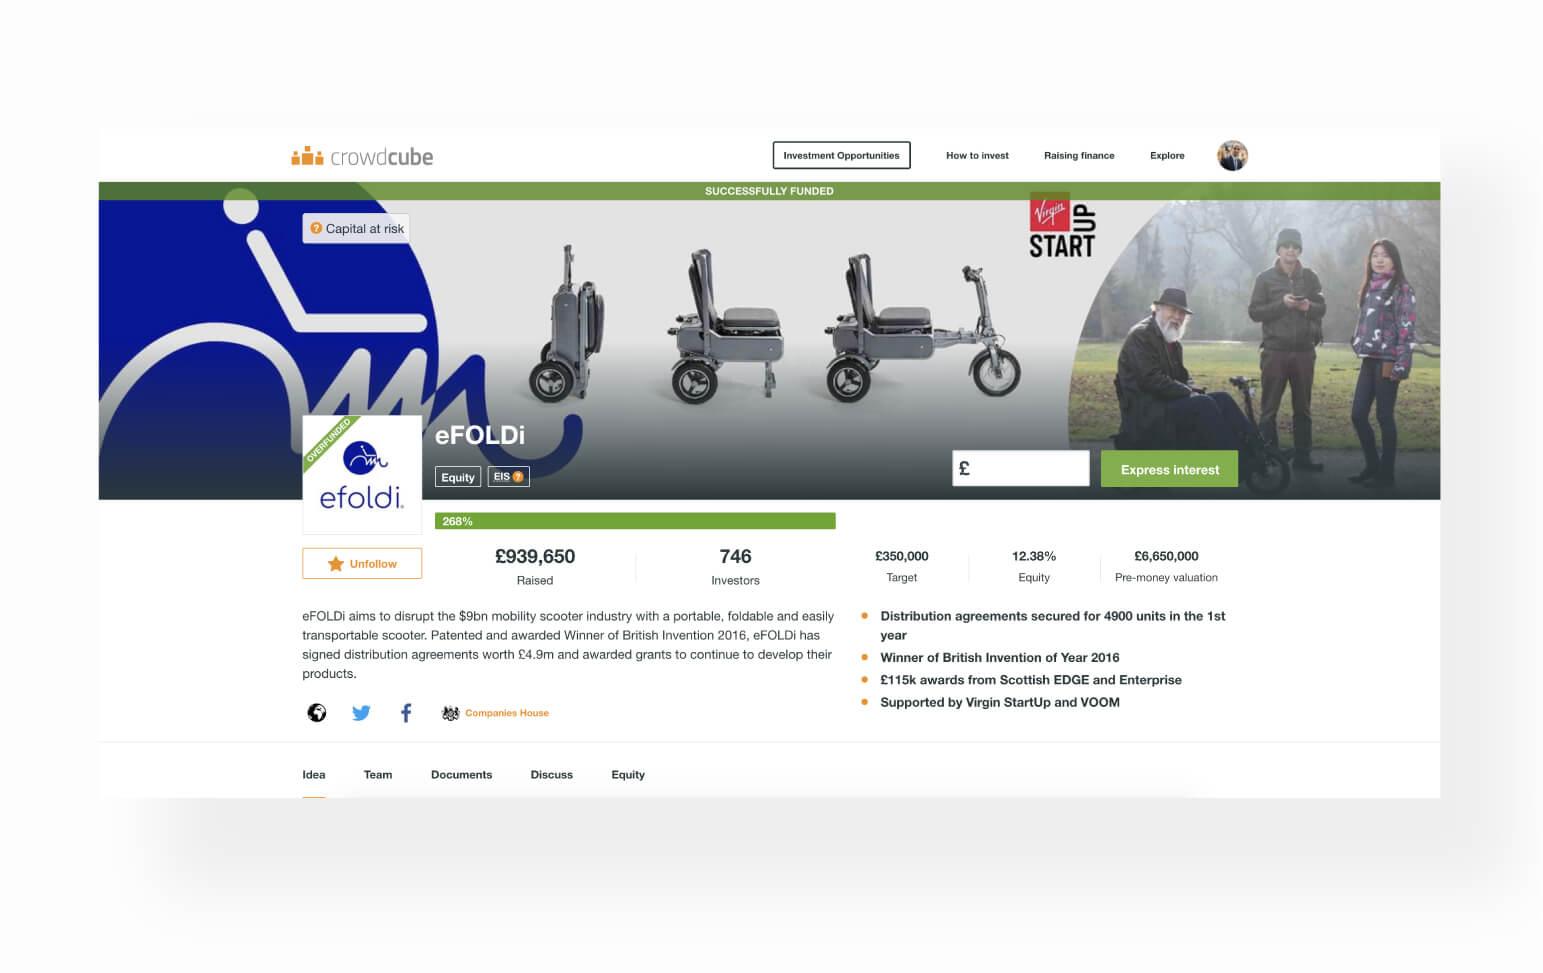 Serkan_Ferah_Branding_Pitching_Design_London_eFoldi-rebranding-crowdfunding-marketing-pitching-pitch-design-04.jpg